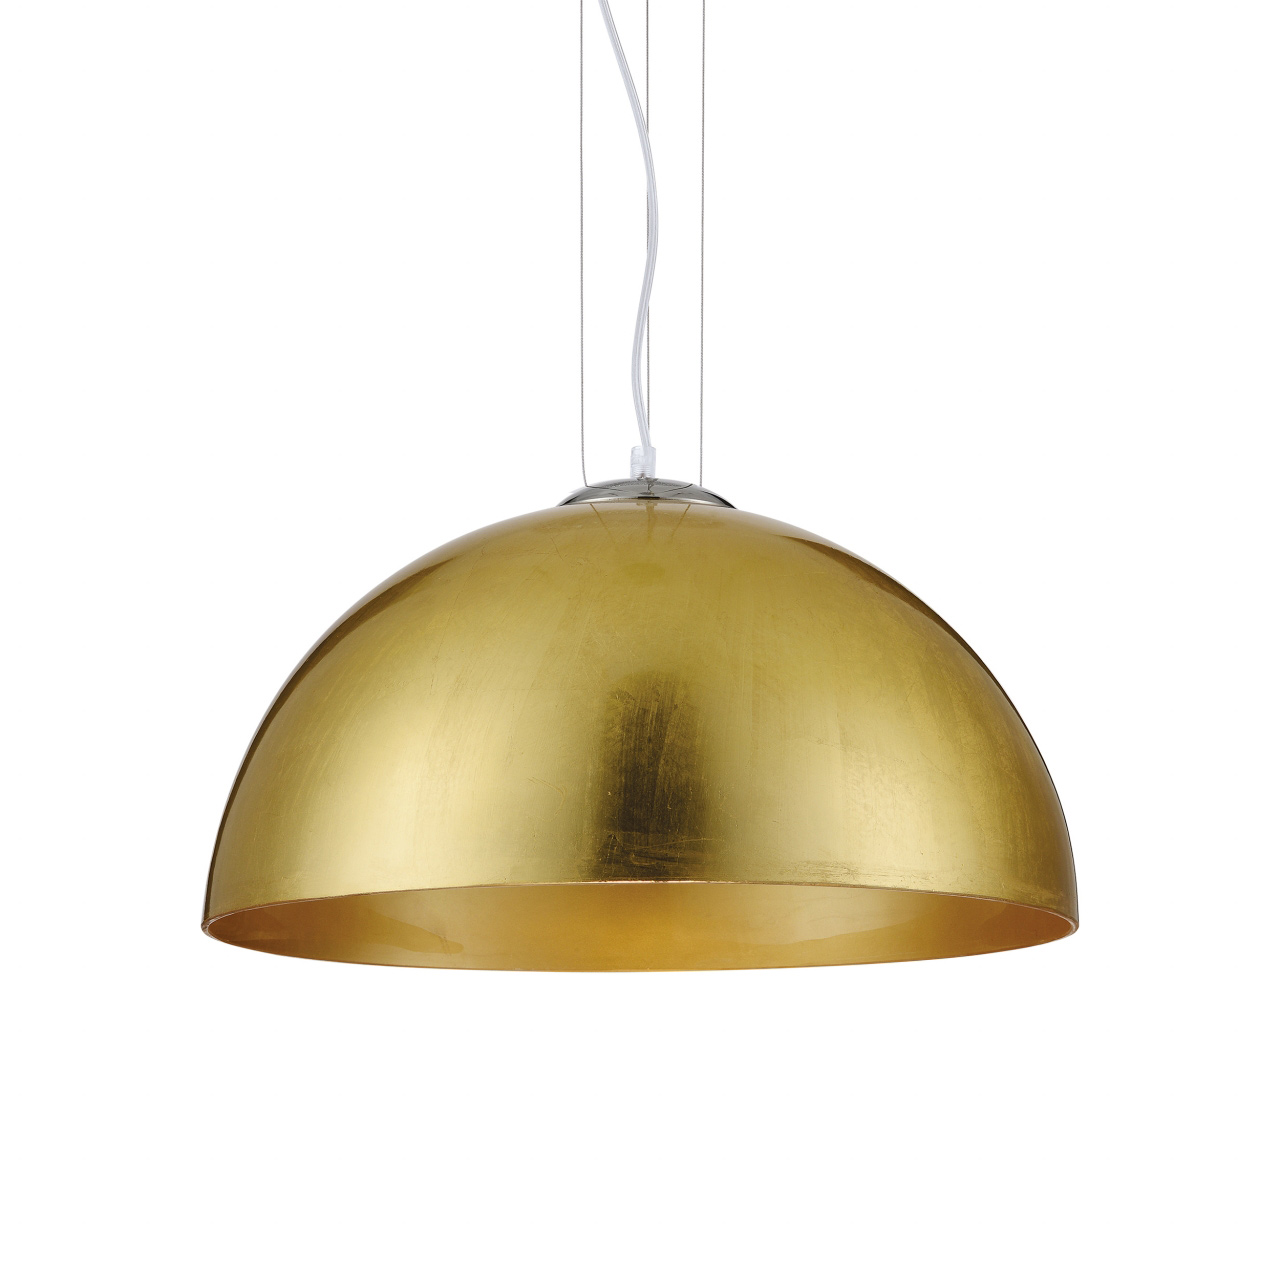 Люстра подвесная Cupola 1х40W E27 золото Lightstar 803012